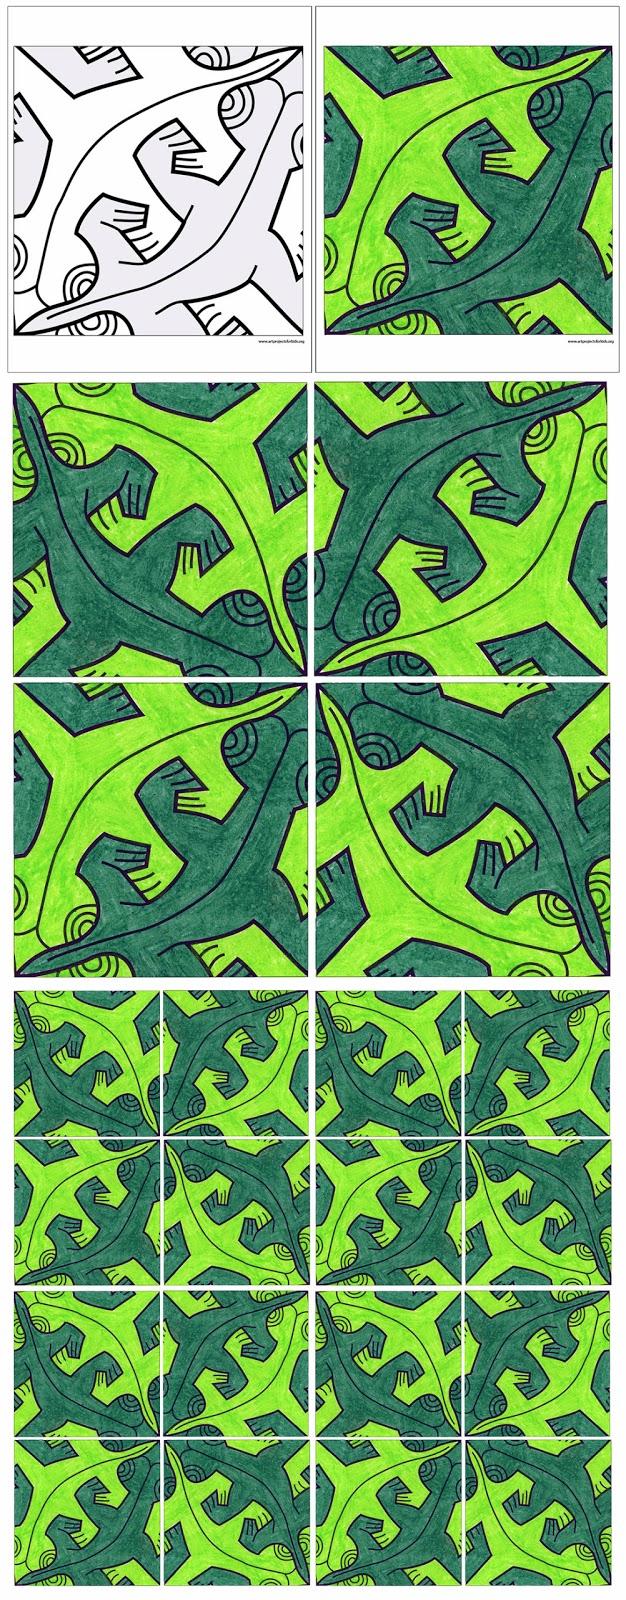 http://3.bp.blogspot.com/-vhGaU12ZaIY/UwKnSdQ-3WI/AAAAAAAASjE/CtRKYMQDfQY/s1600/Escher+diagram.jpg